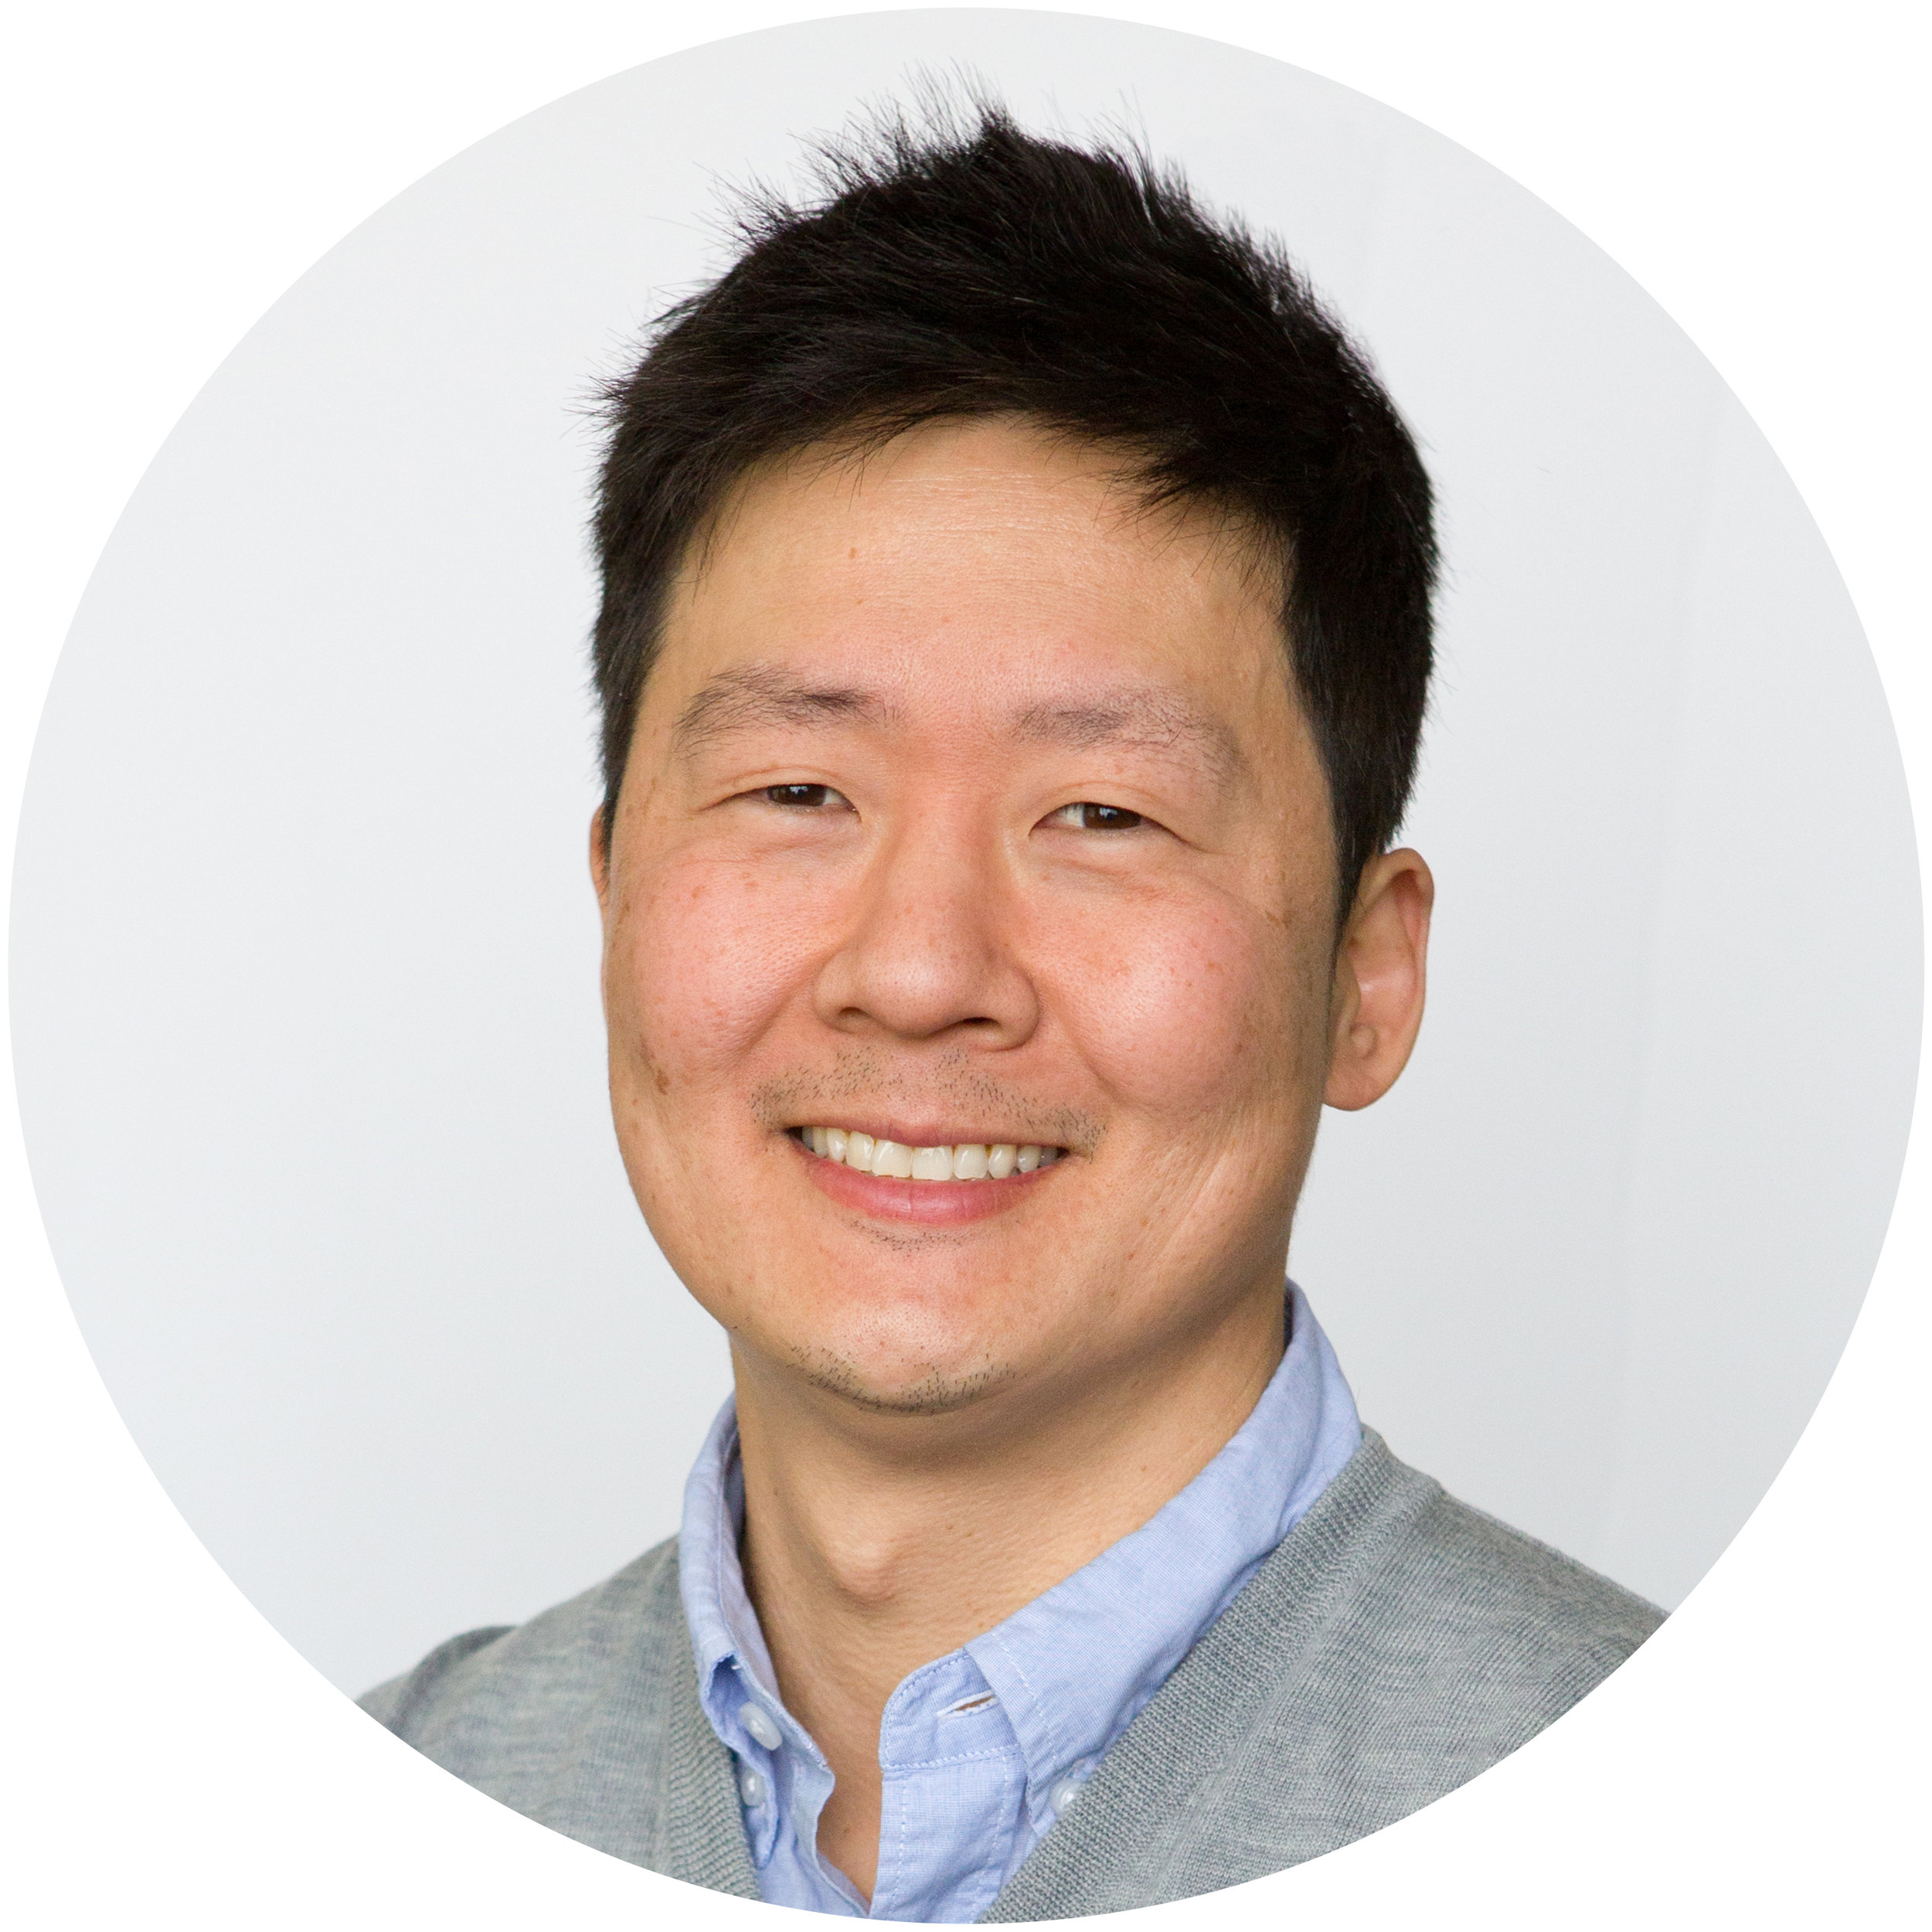 Albert Chung, Ph.D., P.E., Senior Engineer, EHS Compliance Services, KERAMIDA Inc.